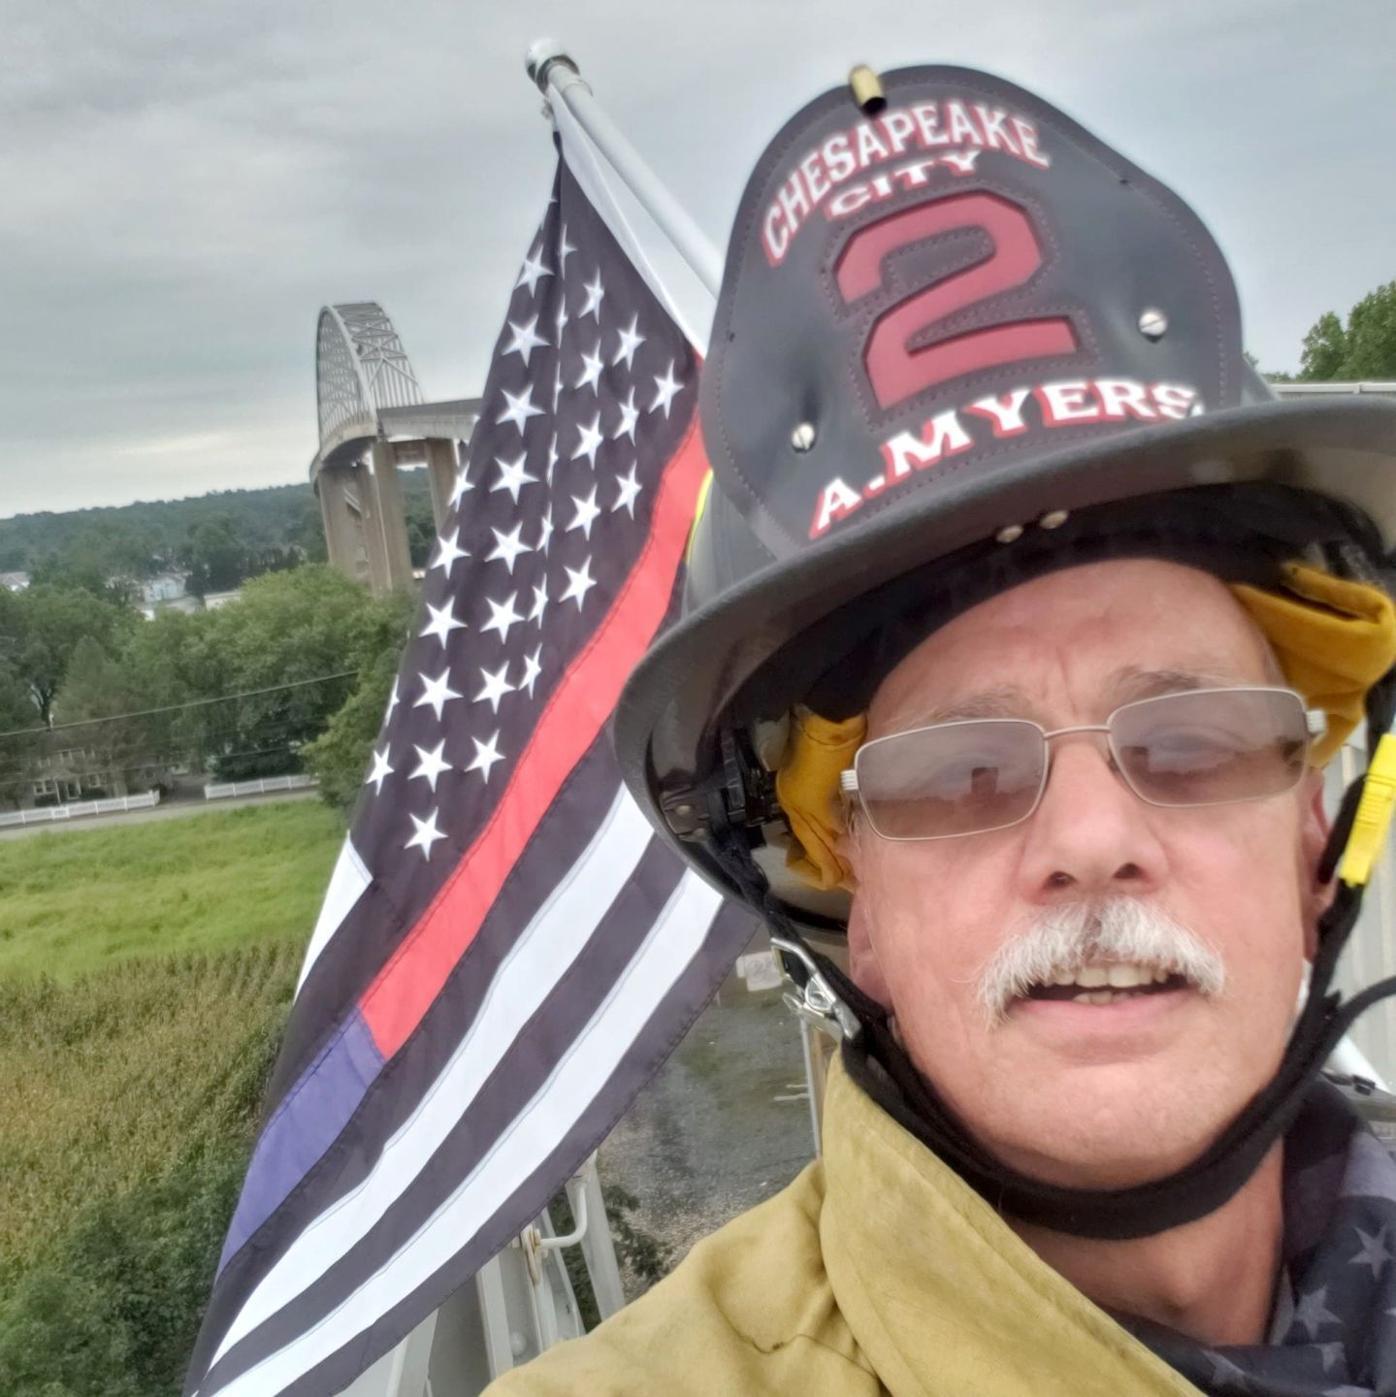 9/11 bridge walke